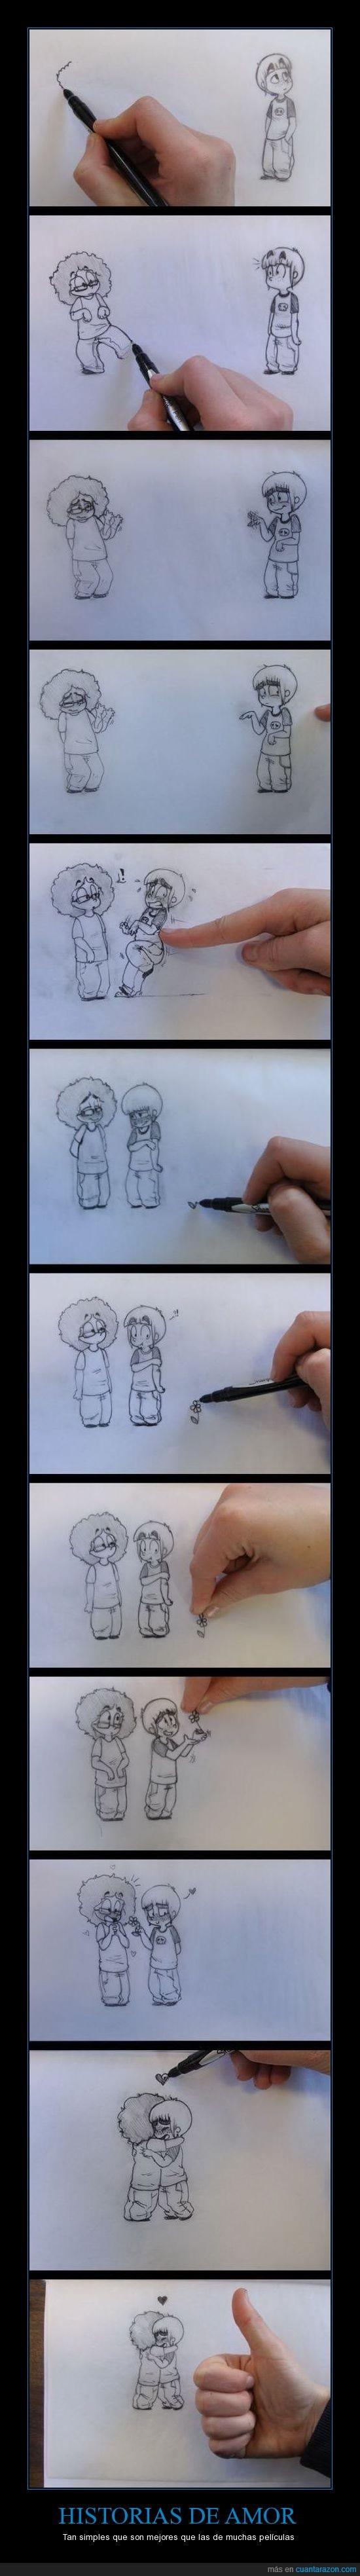 abrazo,amor,chica,chico,dibujod,historia de amor,lápiz,papel